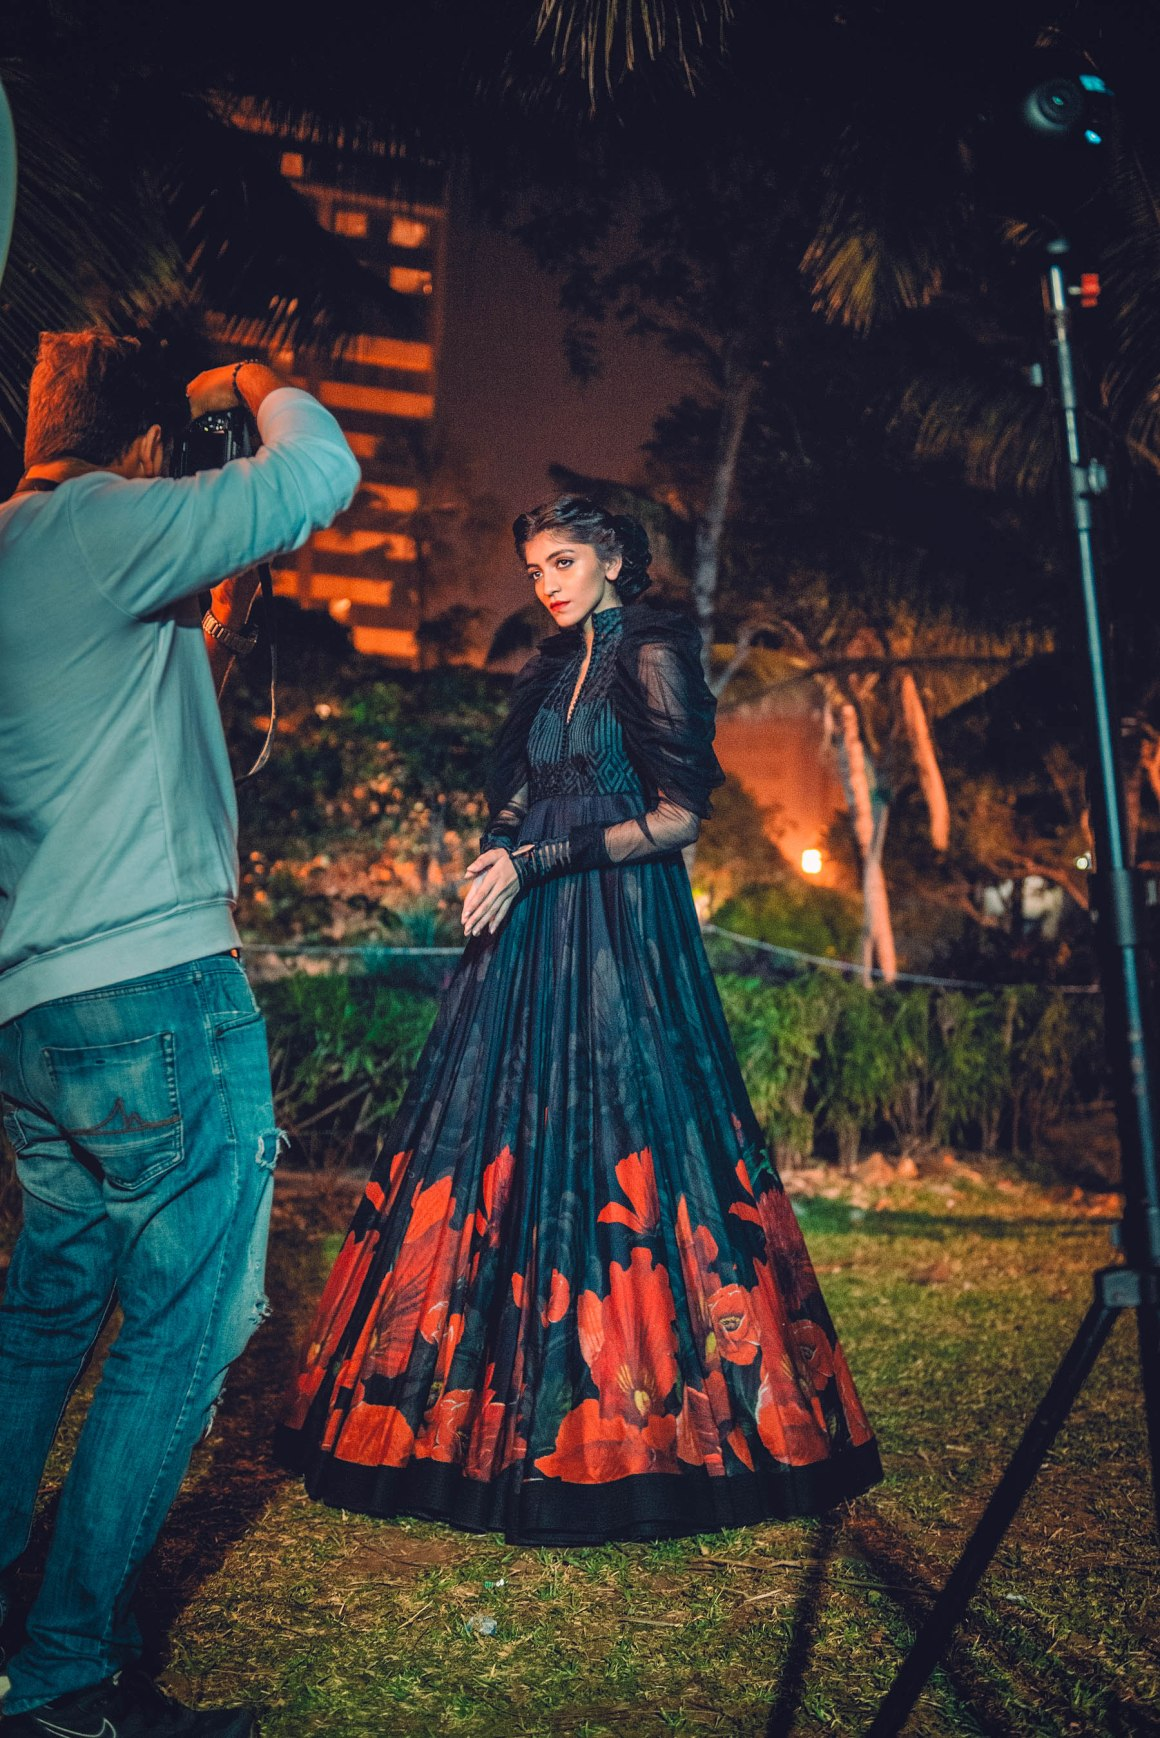 Naina.co, Blenders Pride Fashion Tour, Rohit Bal, Guldasta, Kashmir, Pernod Ricard, Naina Redhu, MadeInIndia, EyesForFashion, Blenders Pride, BPFT2018, BPFT, NAINAxBPFT, MyStyleMyPride, MyHeritageMyPride, Taj Lands End, Bandra Fort, Heritage Building, Bandra, Bombay, Mumbai, Diana Penty, Siddharth Malhotra, Preferred Professionals, Whiskey, Fashion Tour, Fashion Party, Shubha Mudgal, Indian Classical Music, Flowers, Diva Dhawan, Indian Models, Roses, Flower Motifs, Fashion Show, Gudda, Sealink